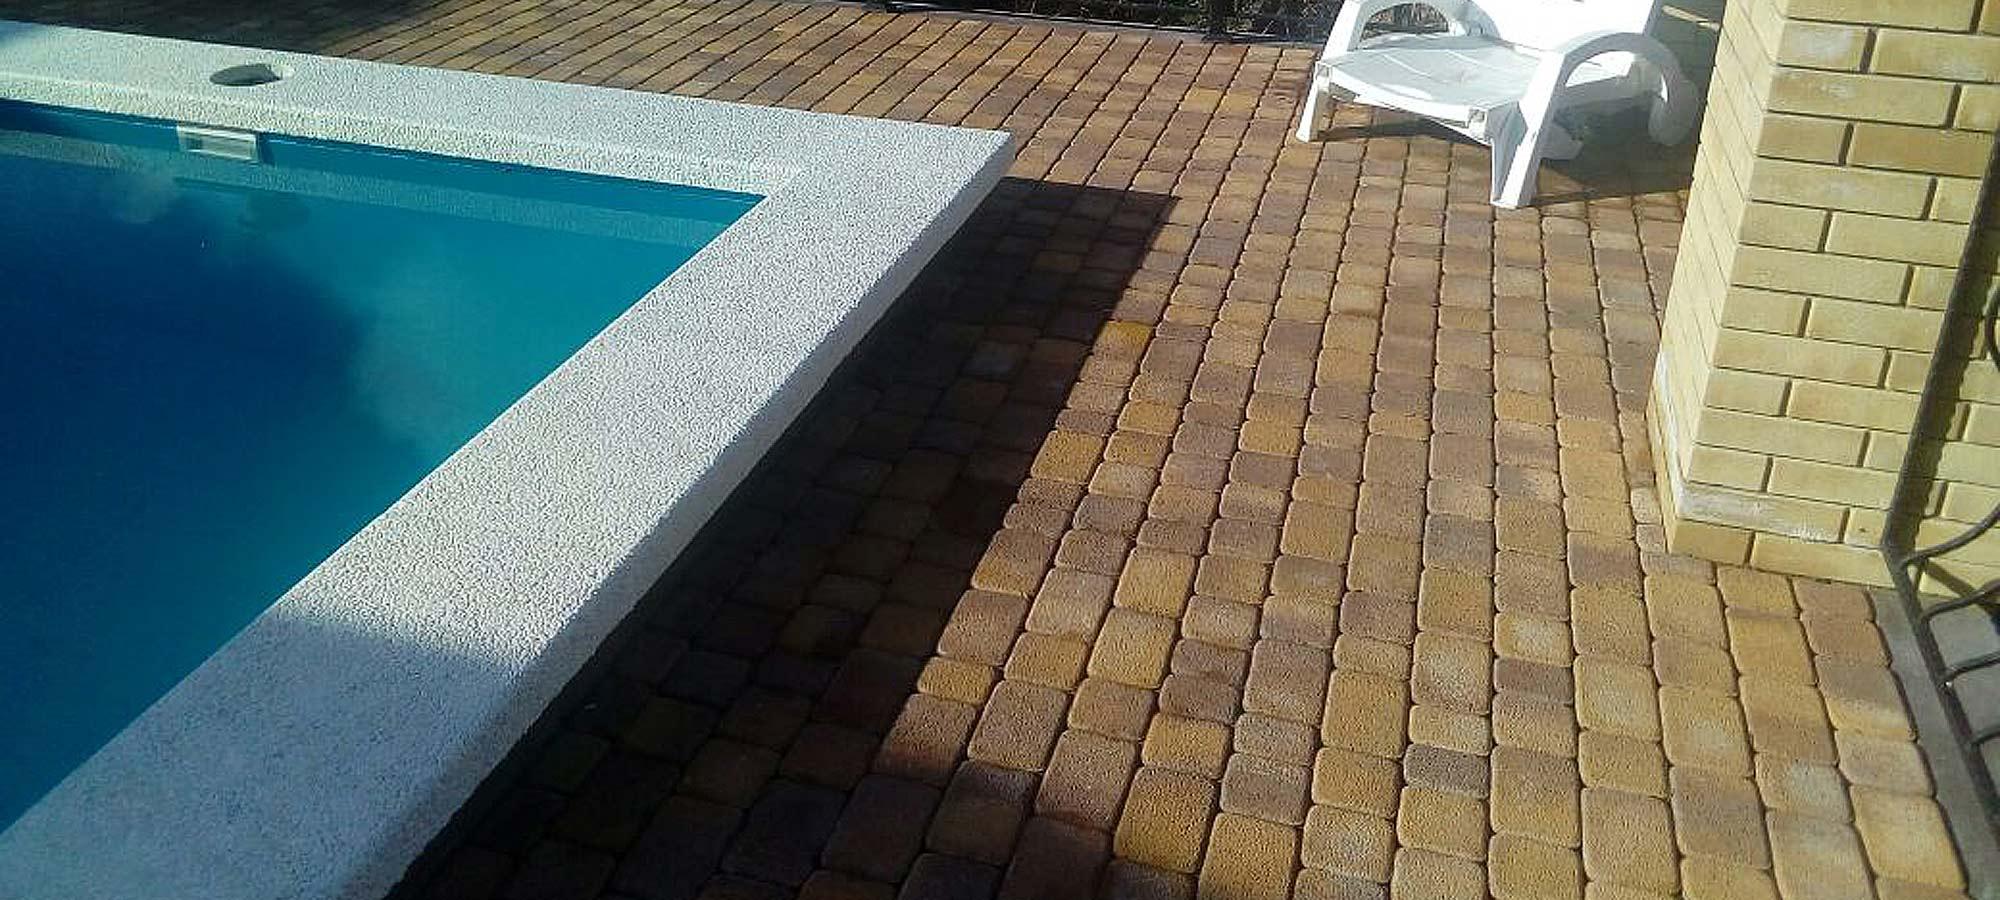 Укладка тротуарной брусчатки вокруг бассейна